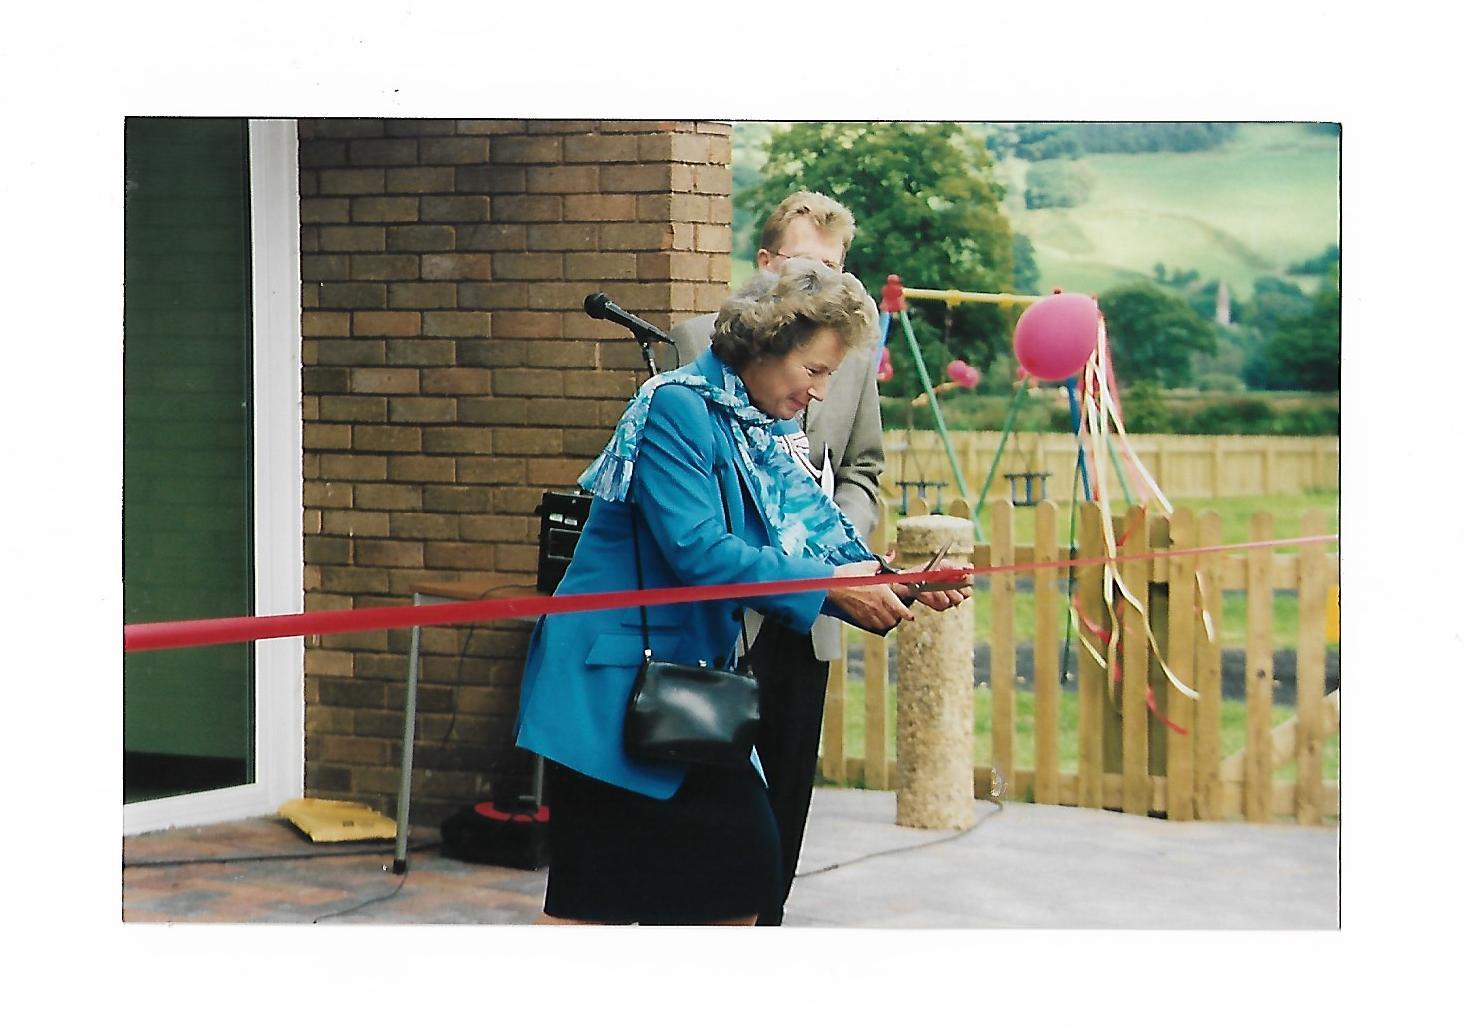 Operning the refurbished playground by Sian Legge Burke High Sherrif of Powys